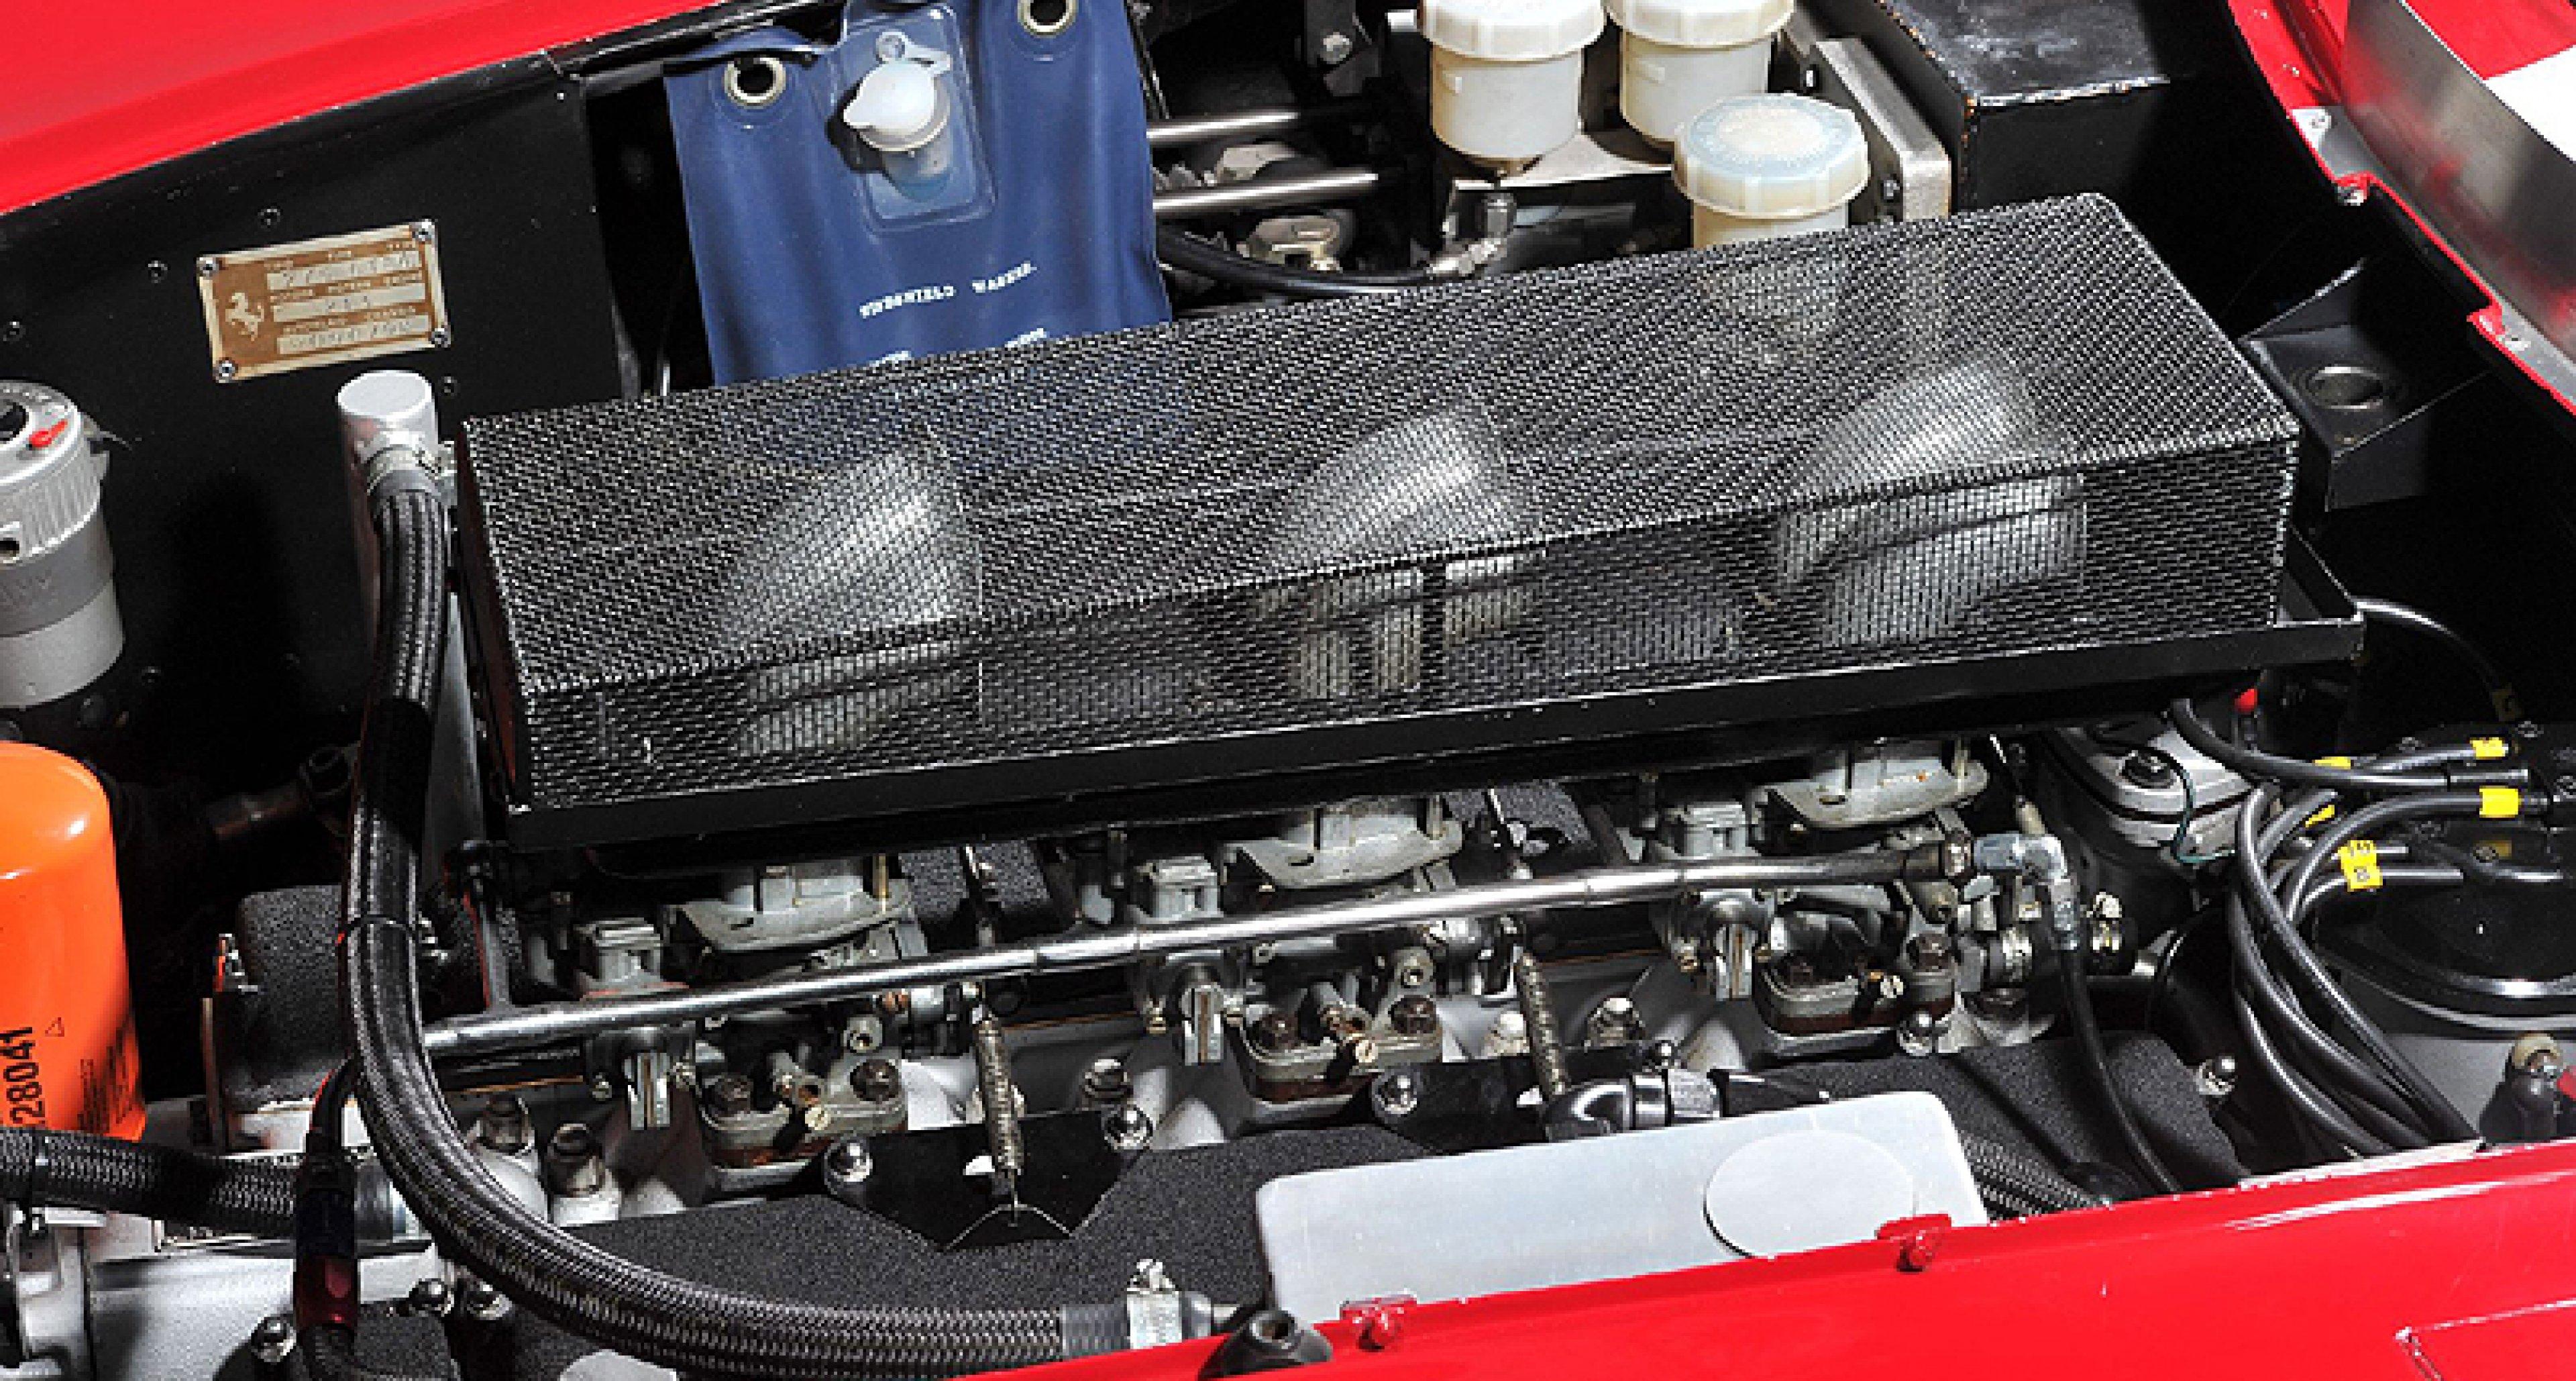 Triple Le Mans Entry 1966 Ferrari 275 GTB/C to Star at Rétromobile 2013